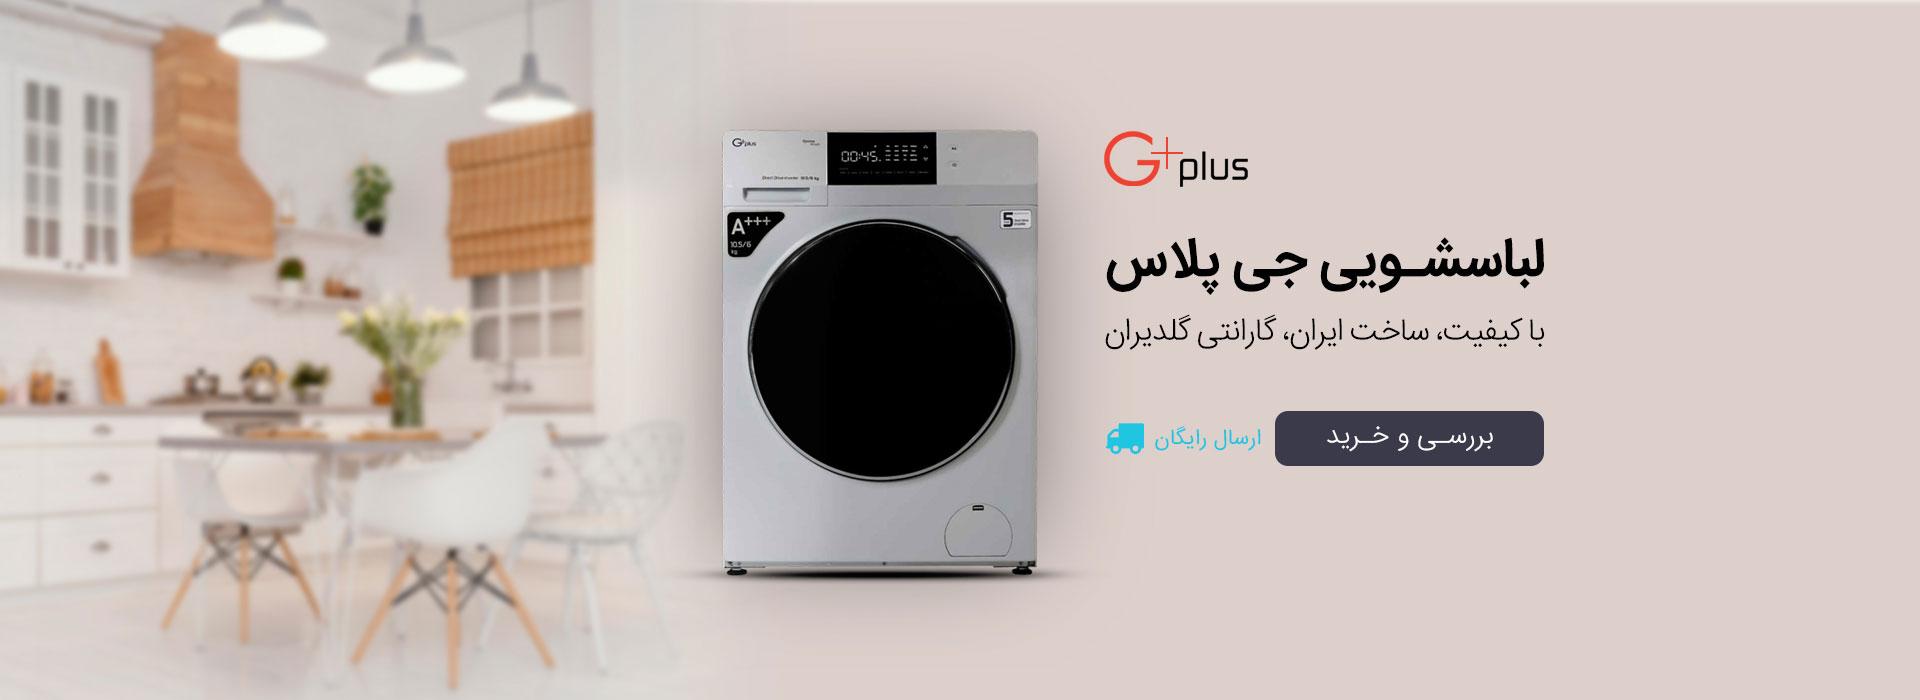 ماشین لباسشویی جی پلاس